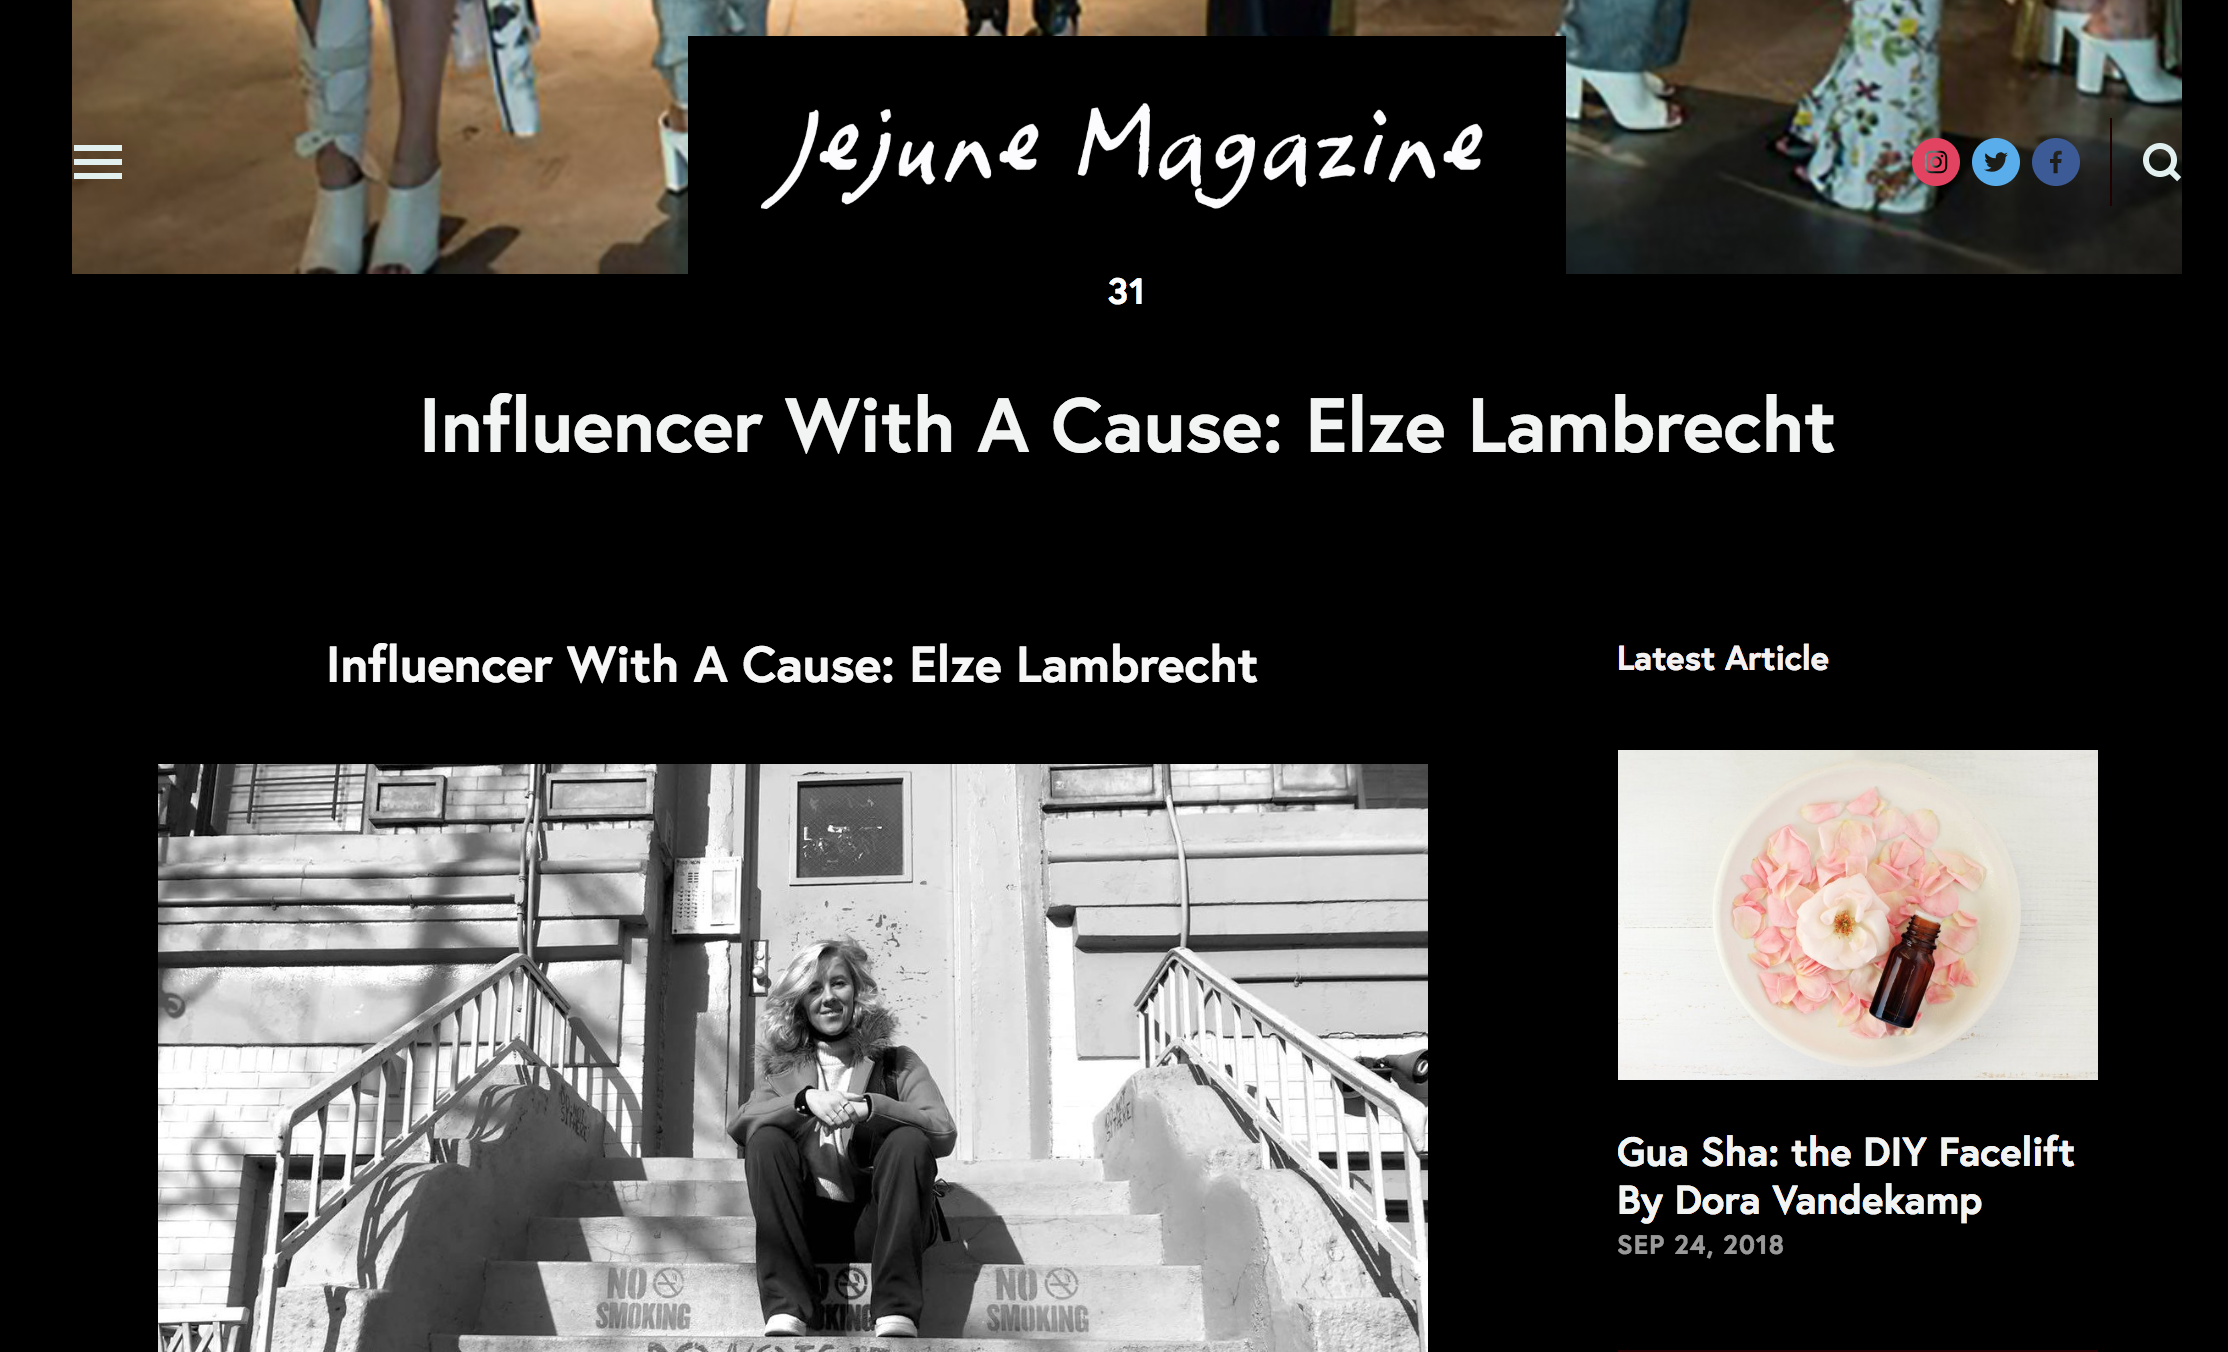 Interview for Jejune Magazine - https://www.jejunemagazine.com/home/2018/8/29/elze-lambrecht